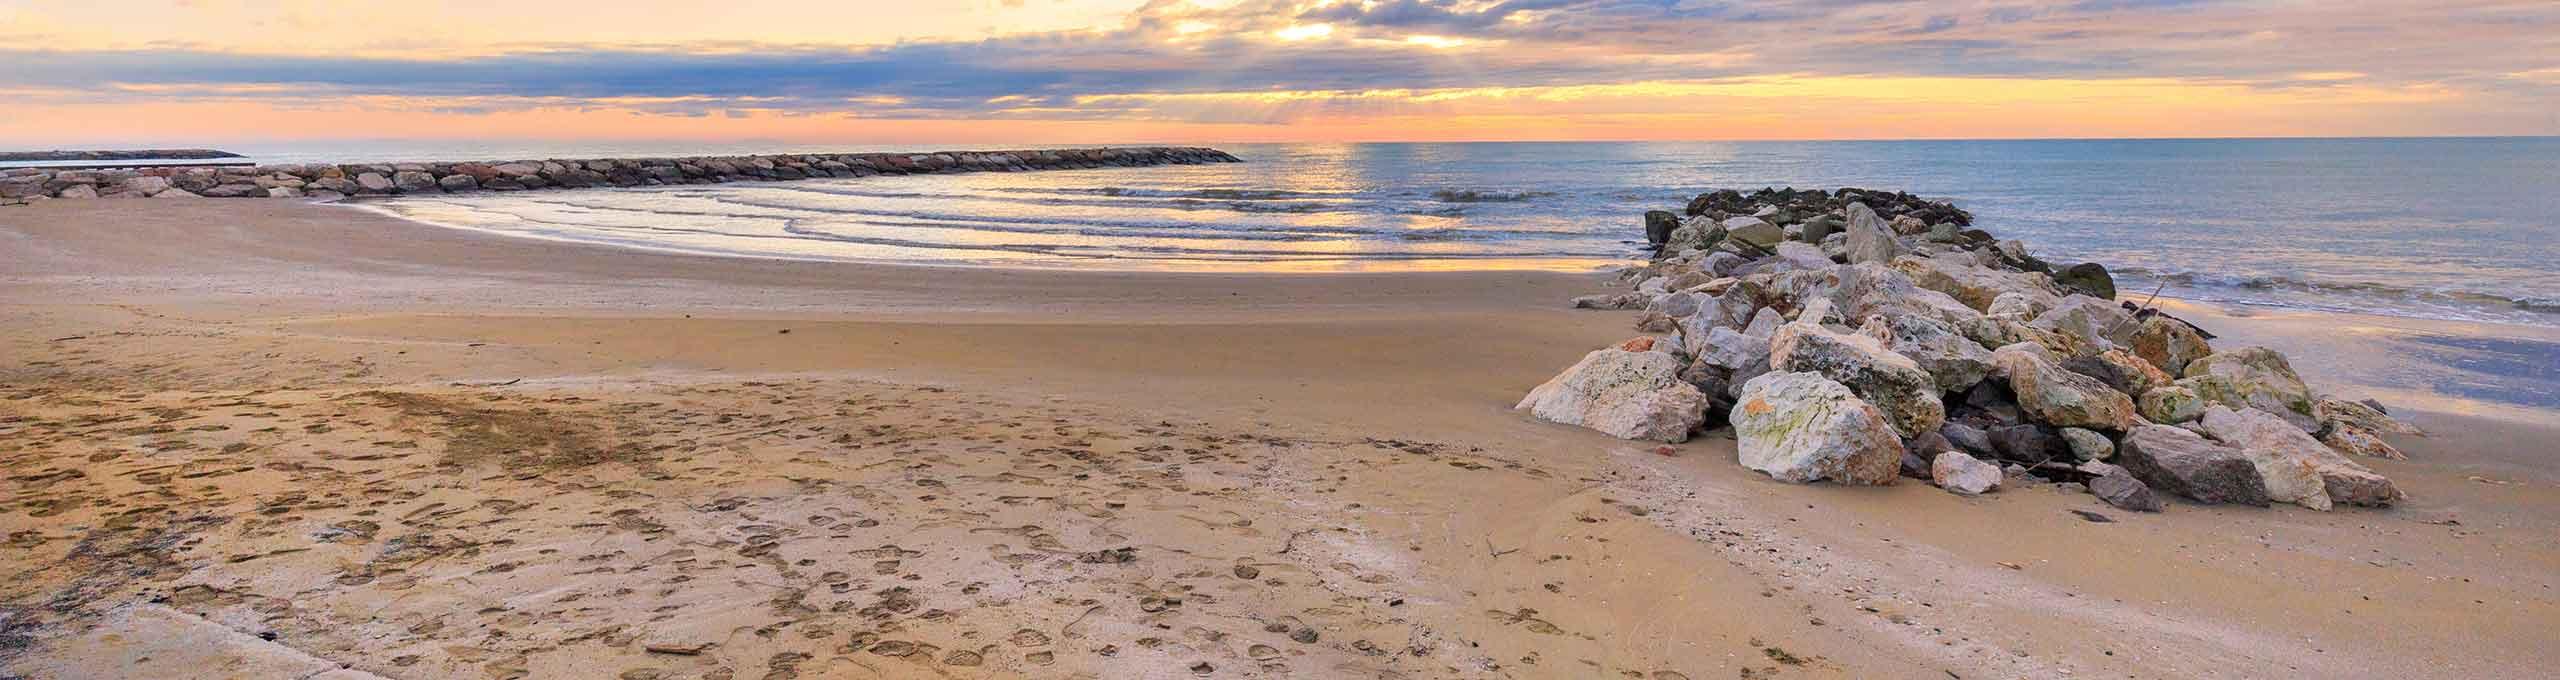 Spiaggia Duna Verde